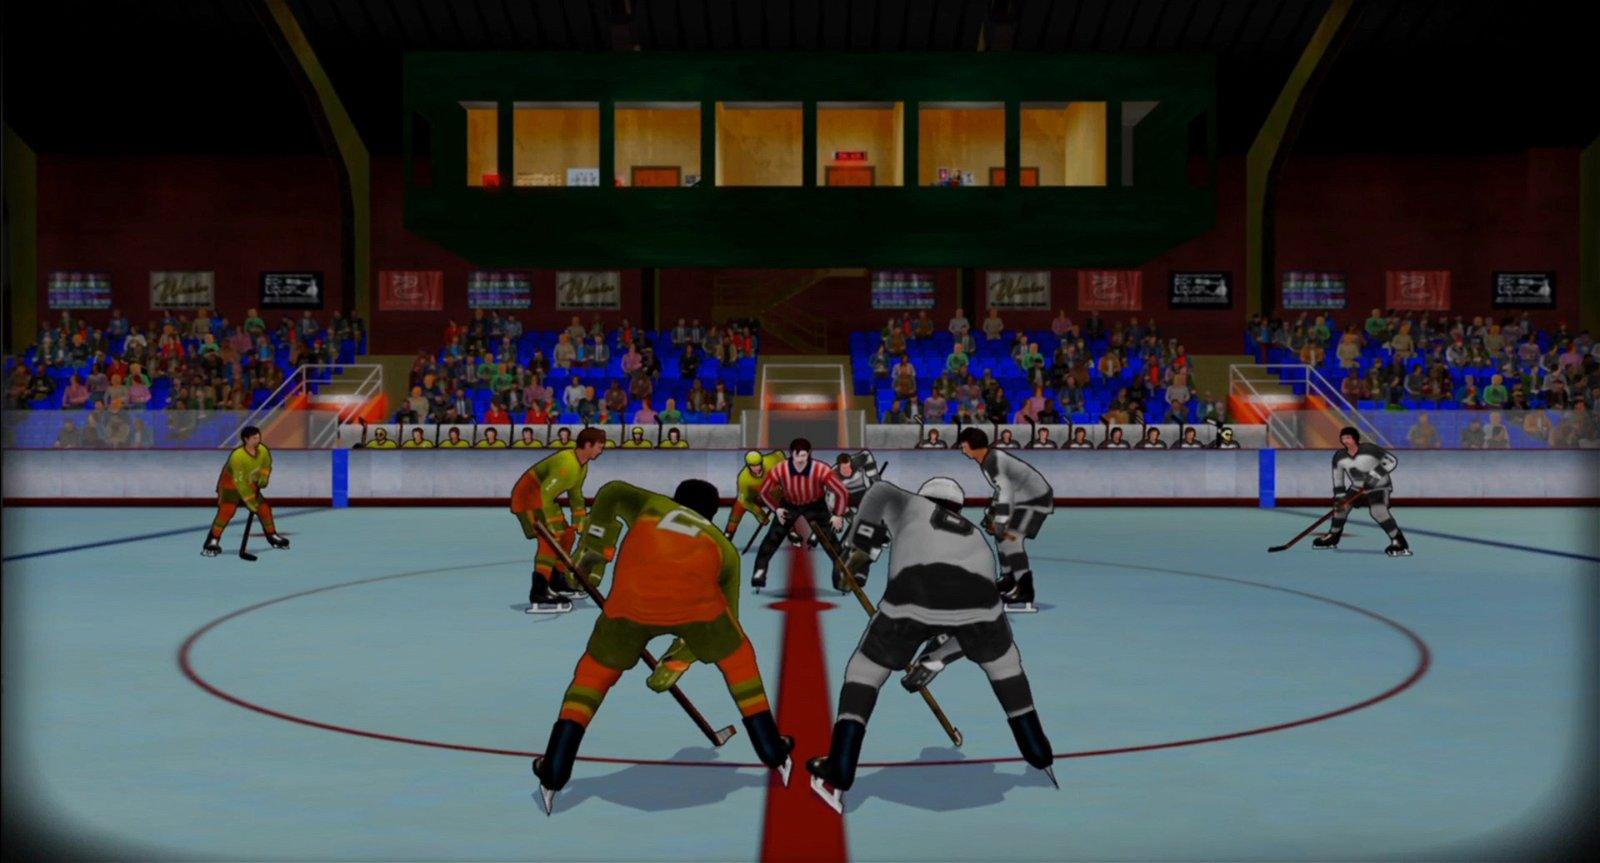 Old Time Hockey Review - Hitz Meets Slapshot 2